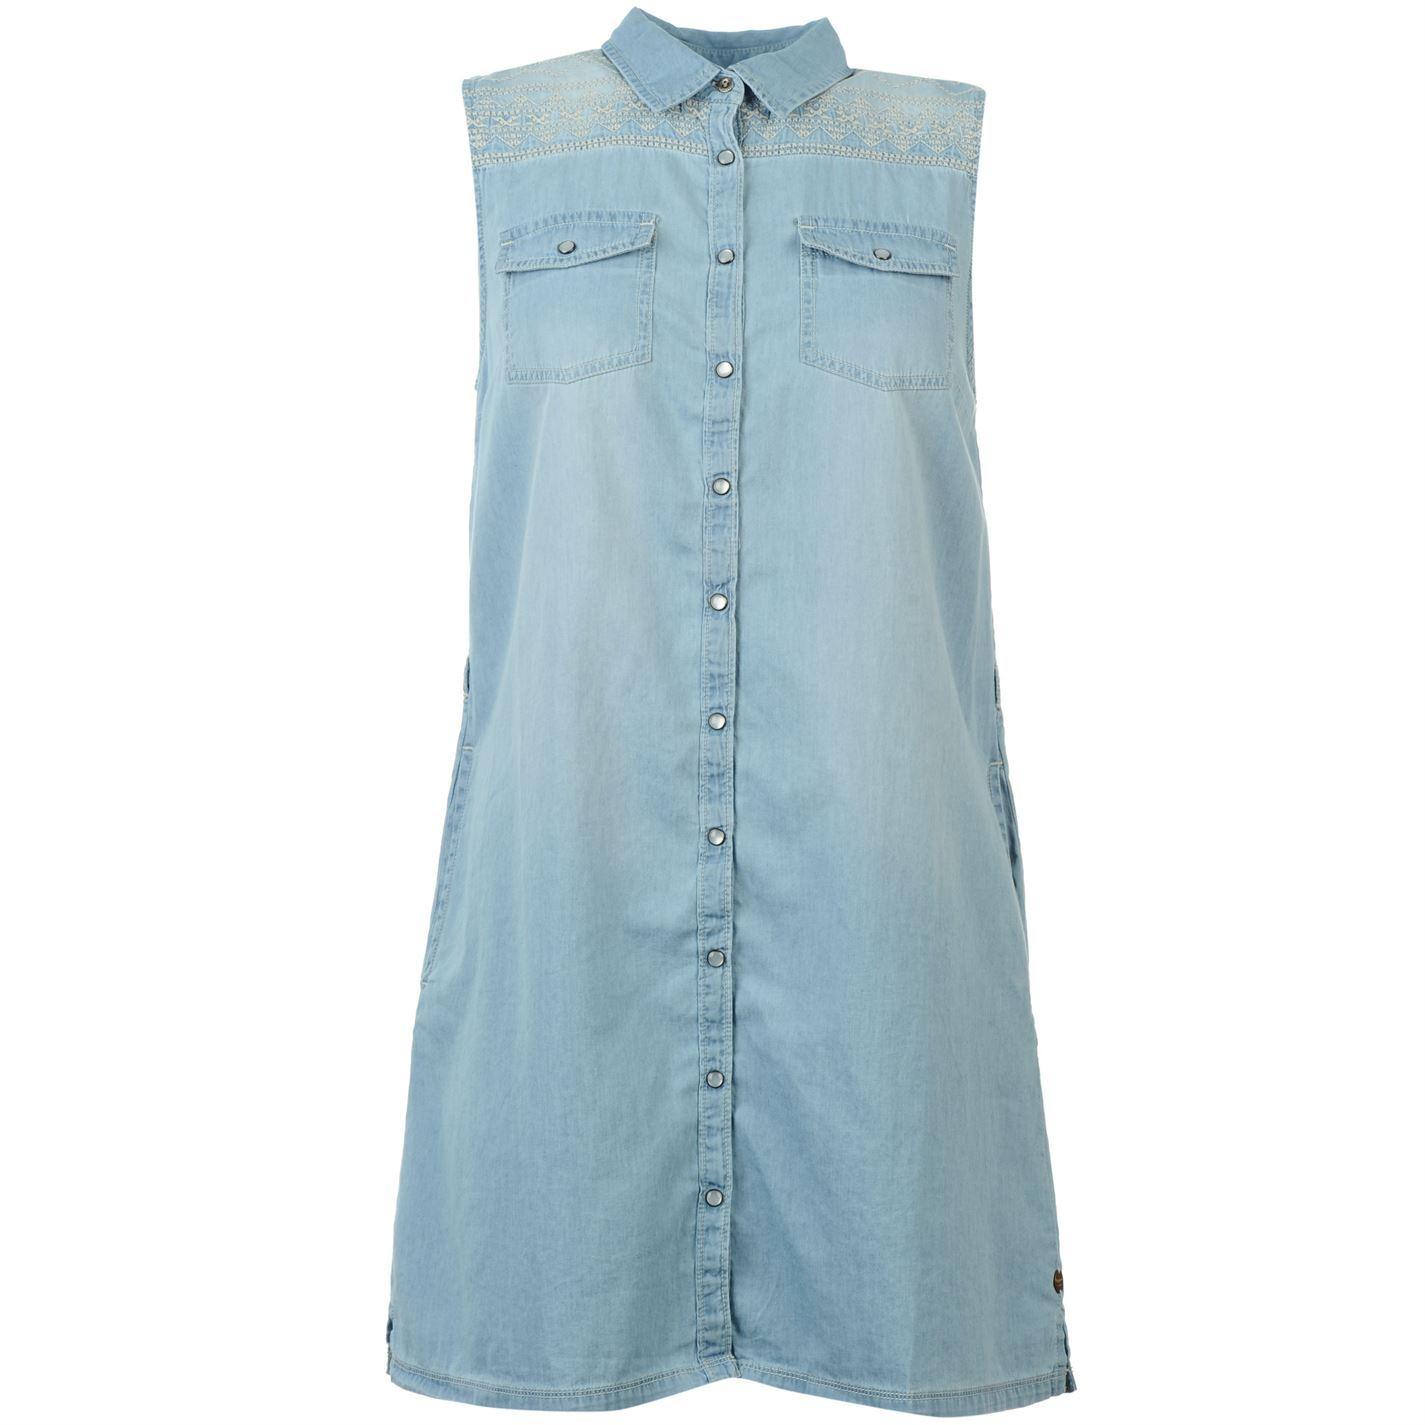 Pepe jeans womens lupita shirt dress ladies sleeveless for Sleeveless dress shirt womens